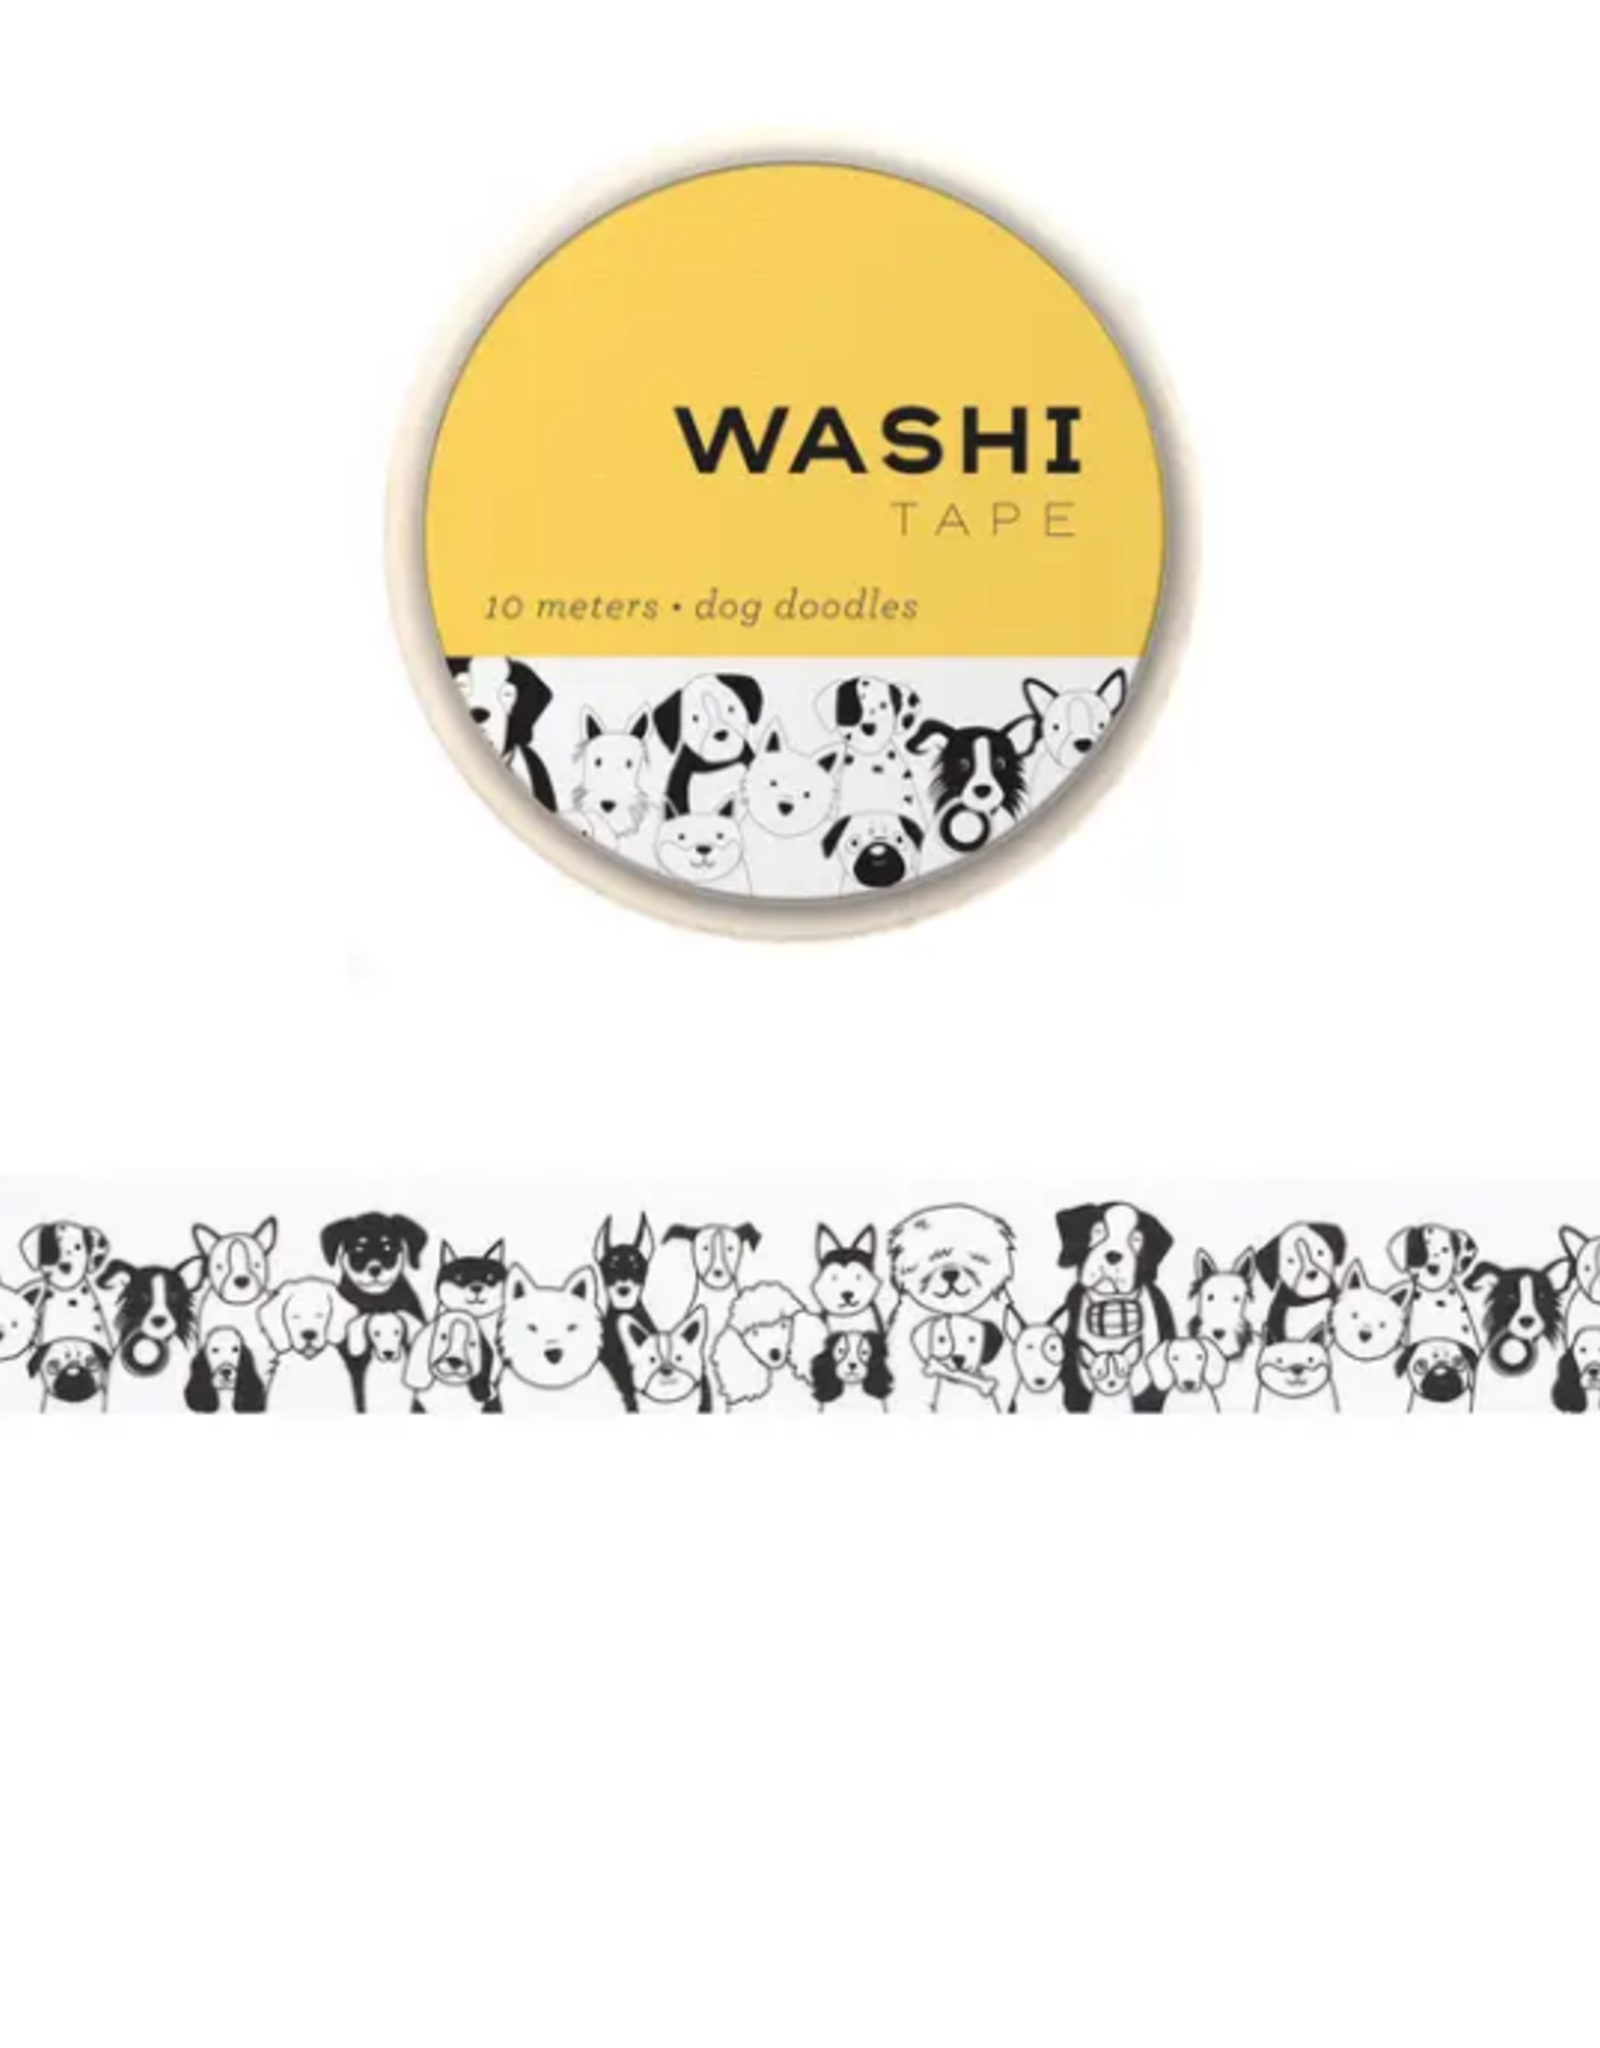 Girl of All Work Dog doodles washi tape